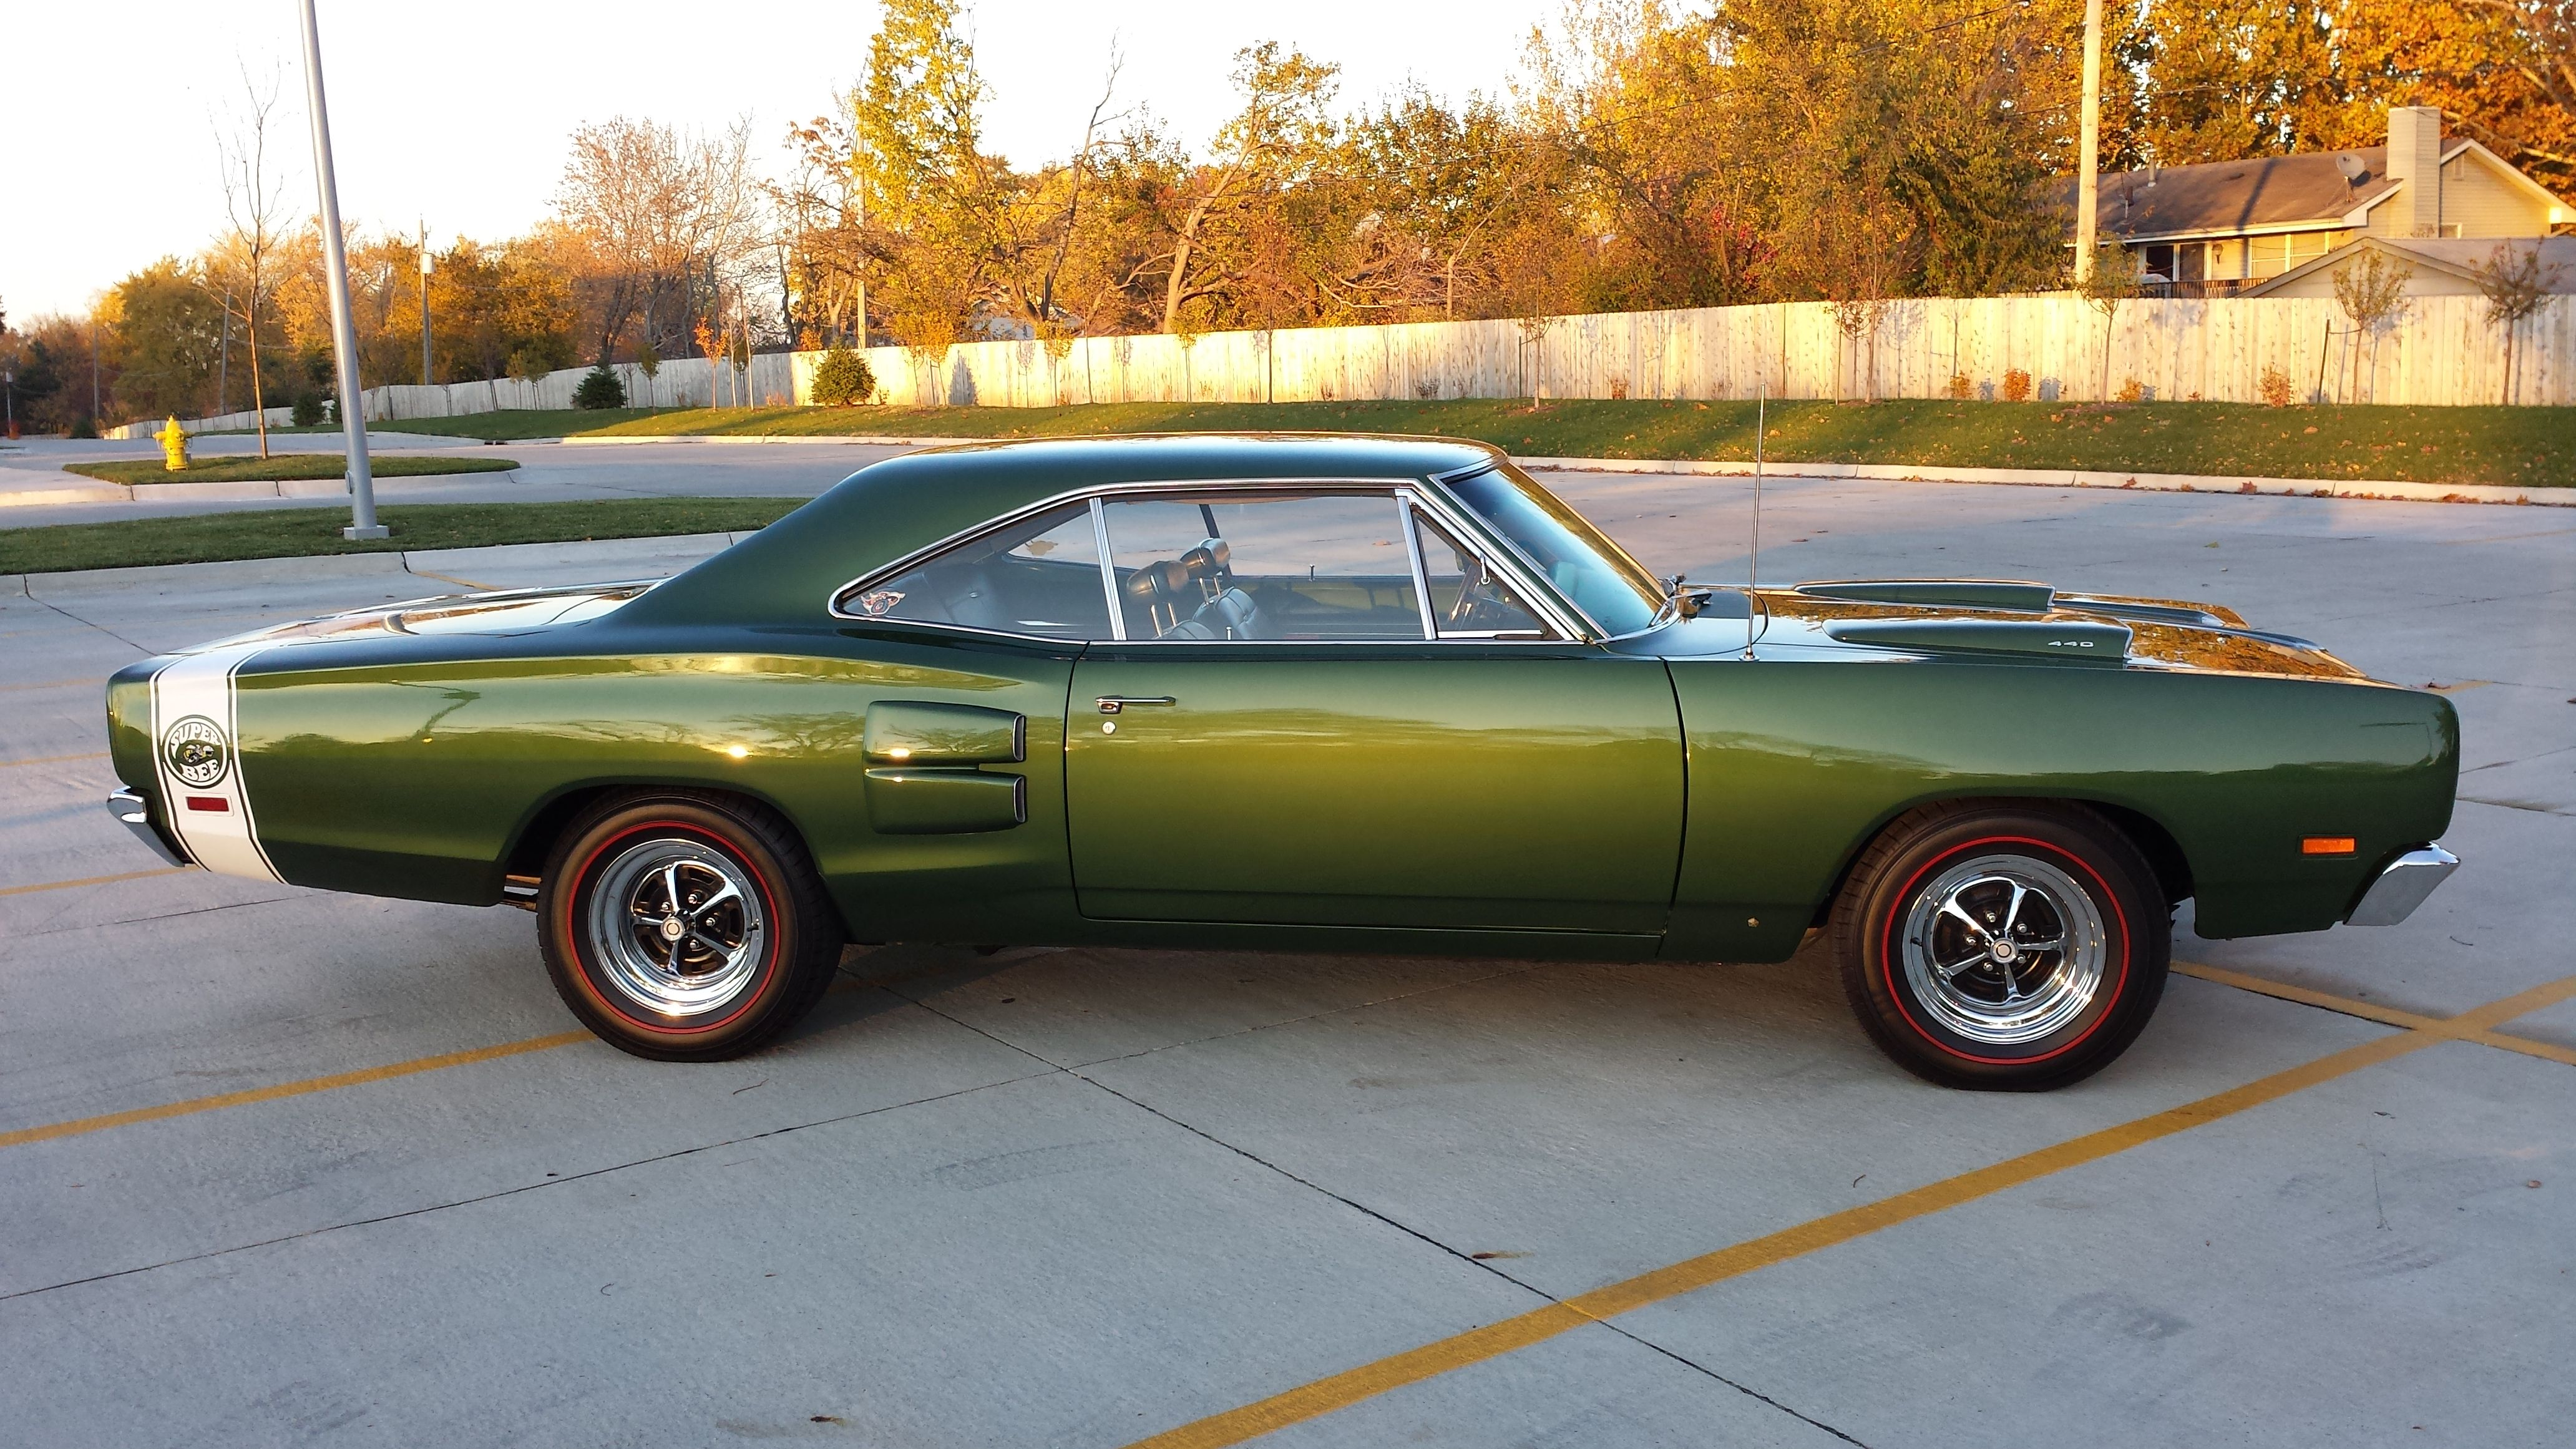 1969 Dodge Super Bee | My Chariot Awaits | Pinterest | Dodge super ...